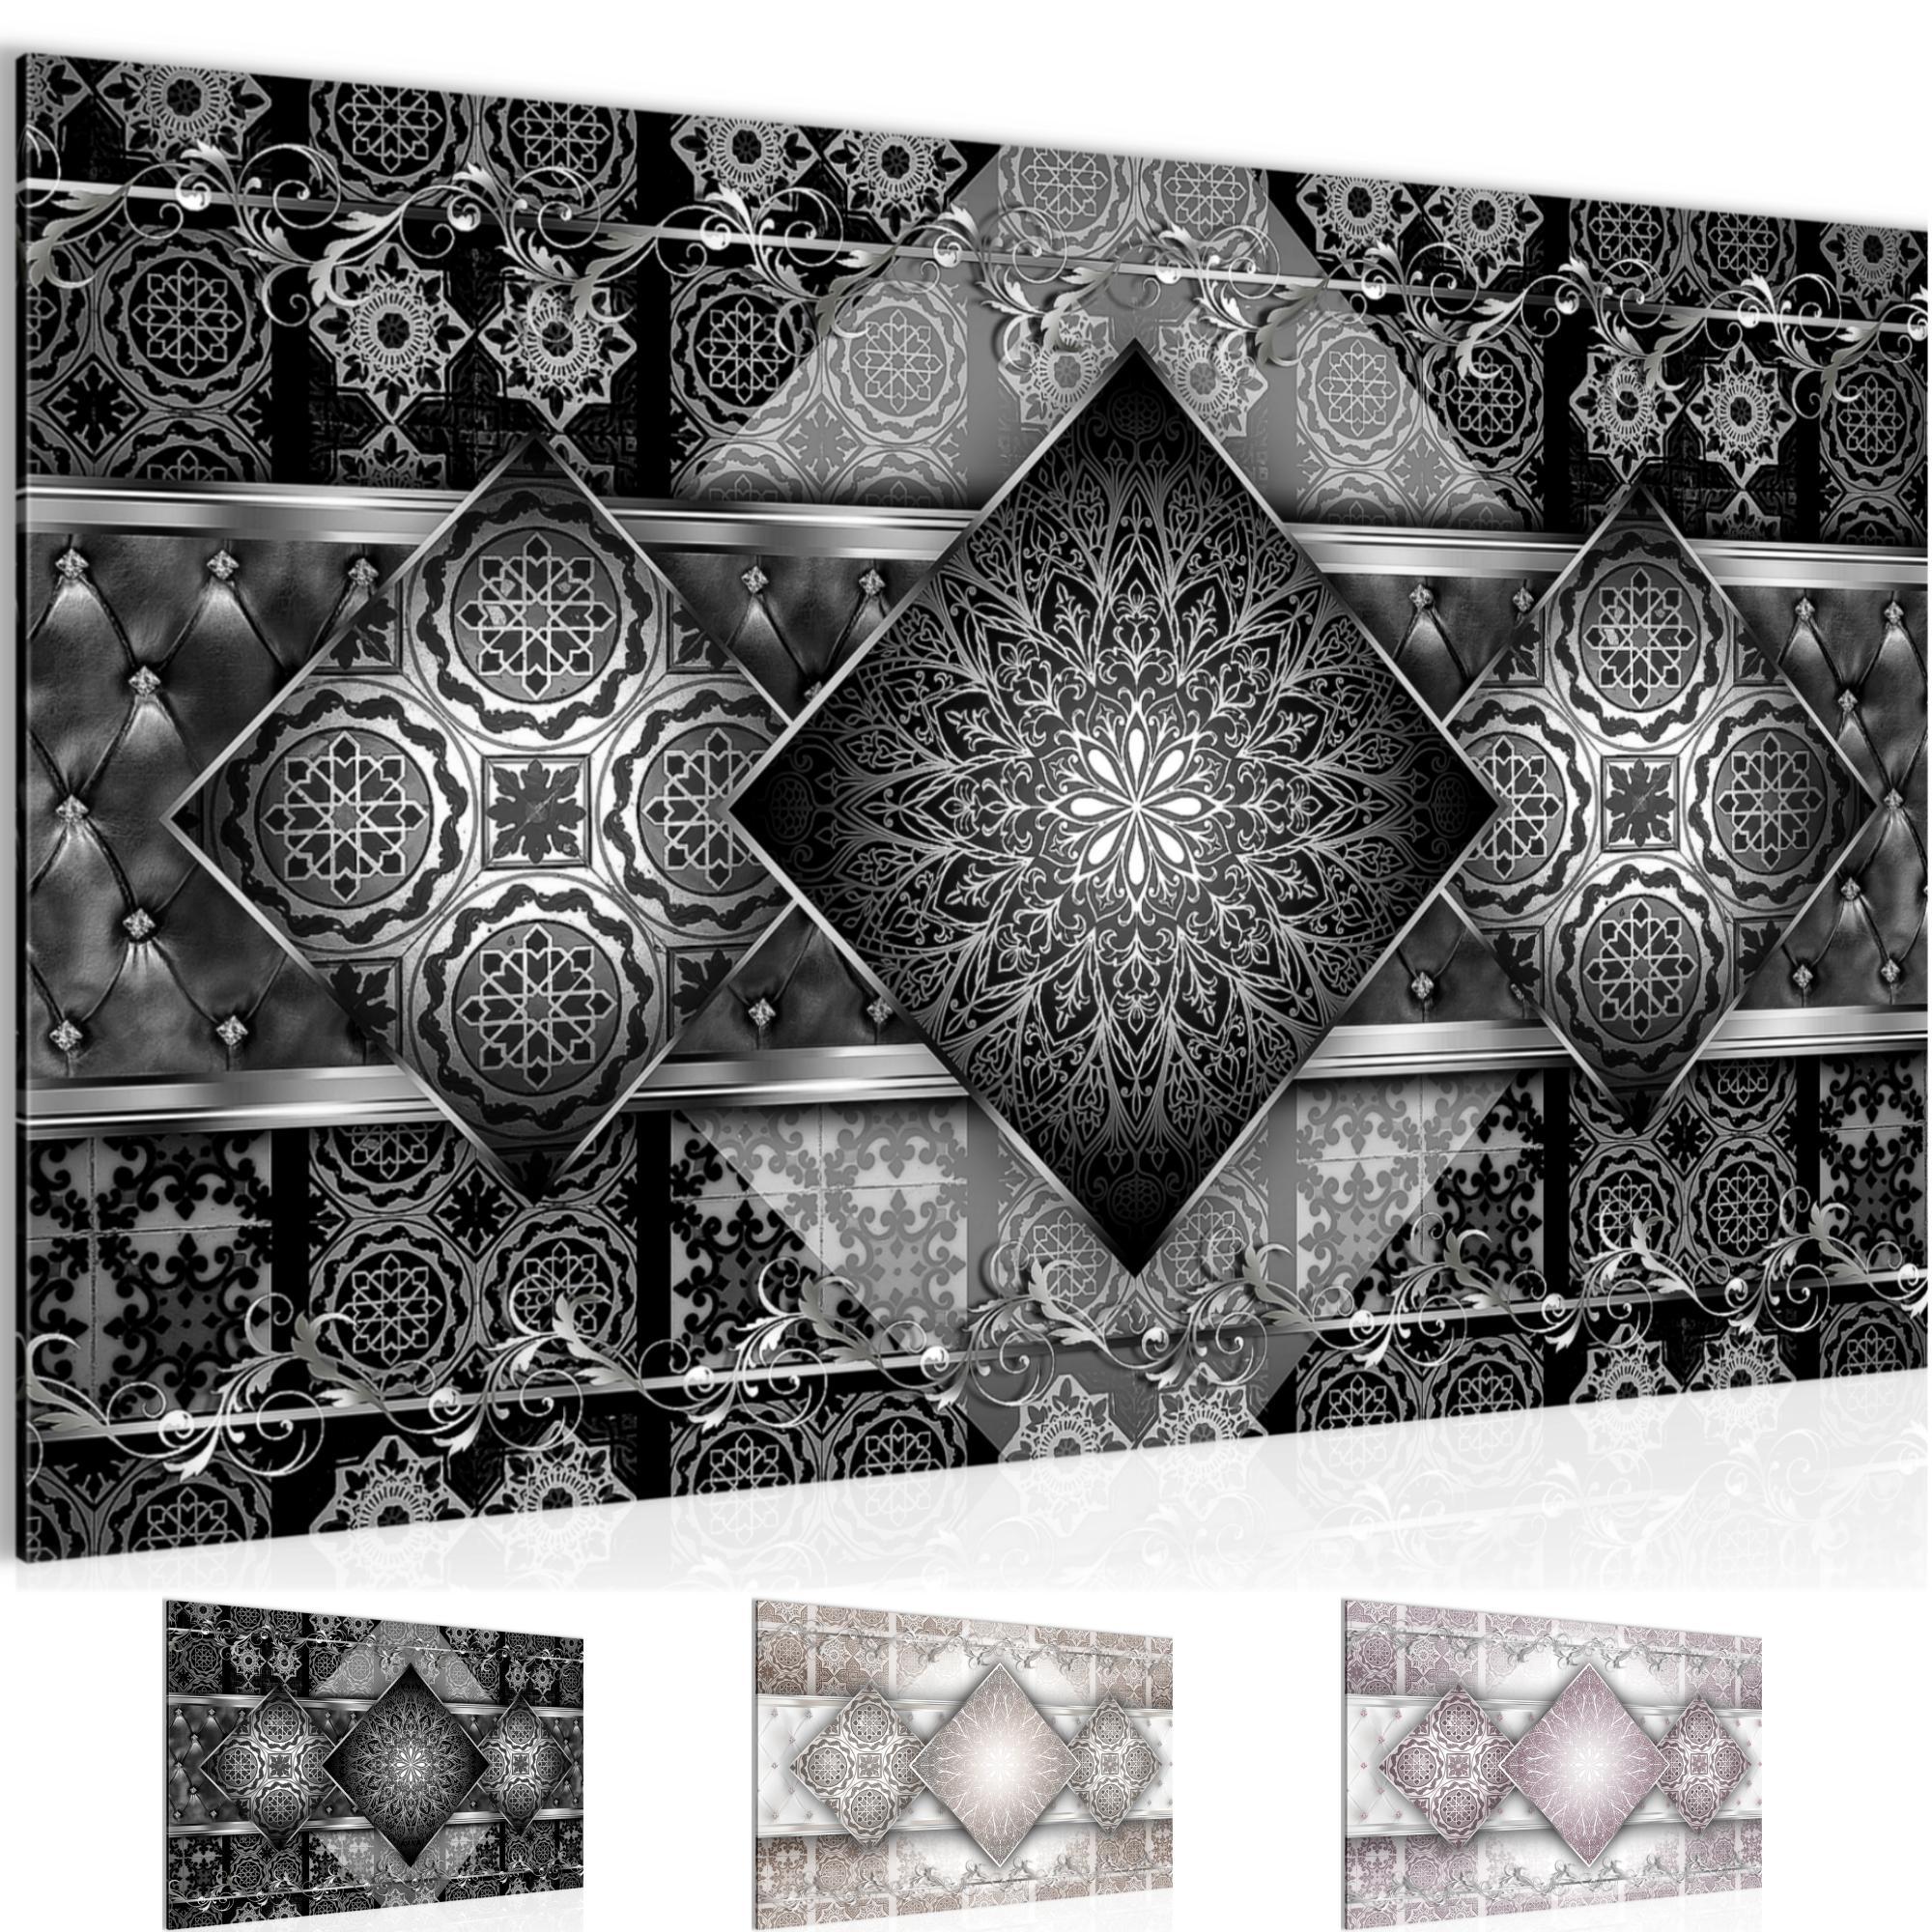 Abstrakt Mandala Bild Kunstdruck Auf Vlies Leinwand Xxl